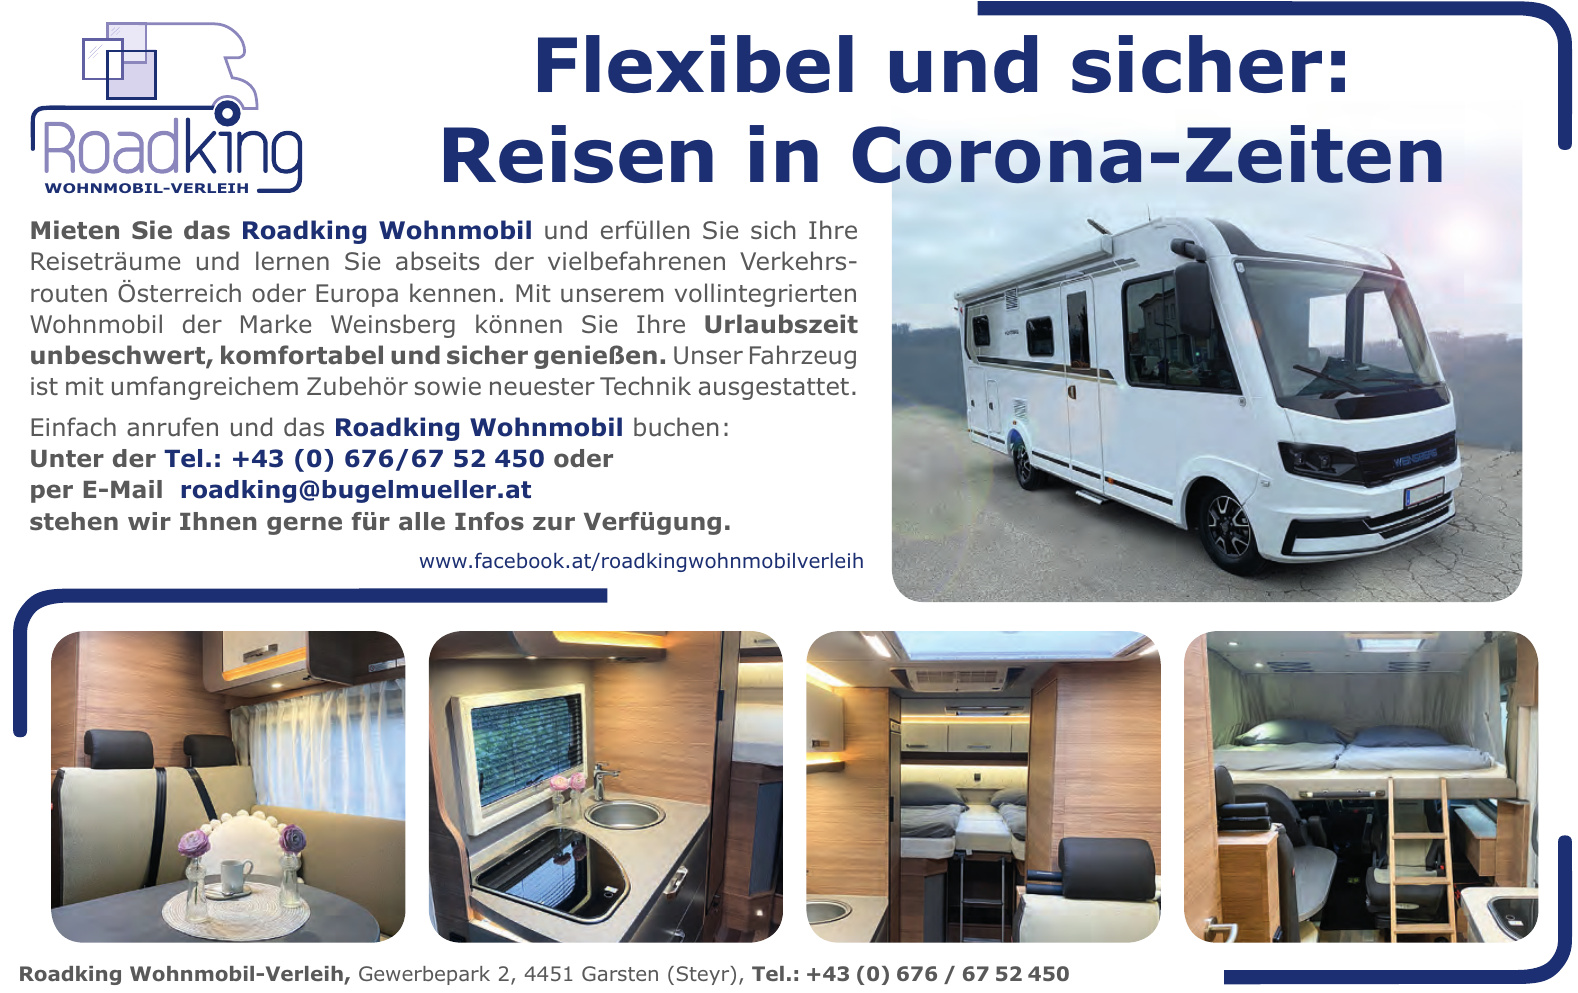 Roadking Wohnmobil-Verleih